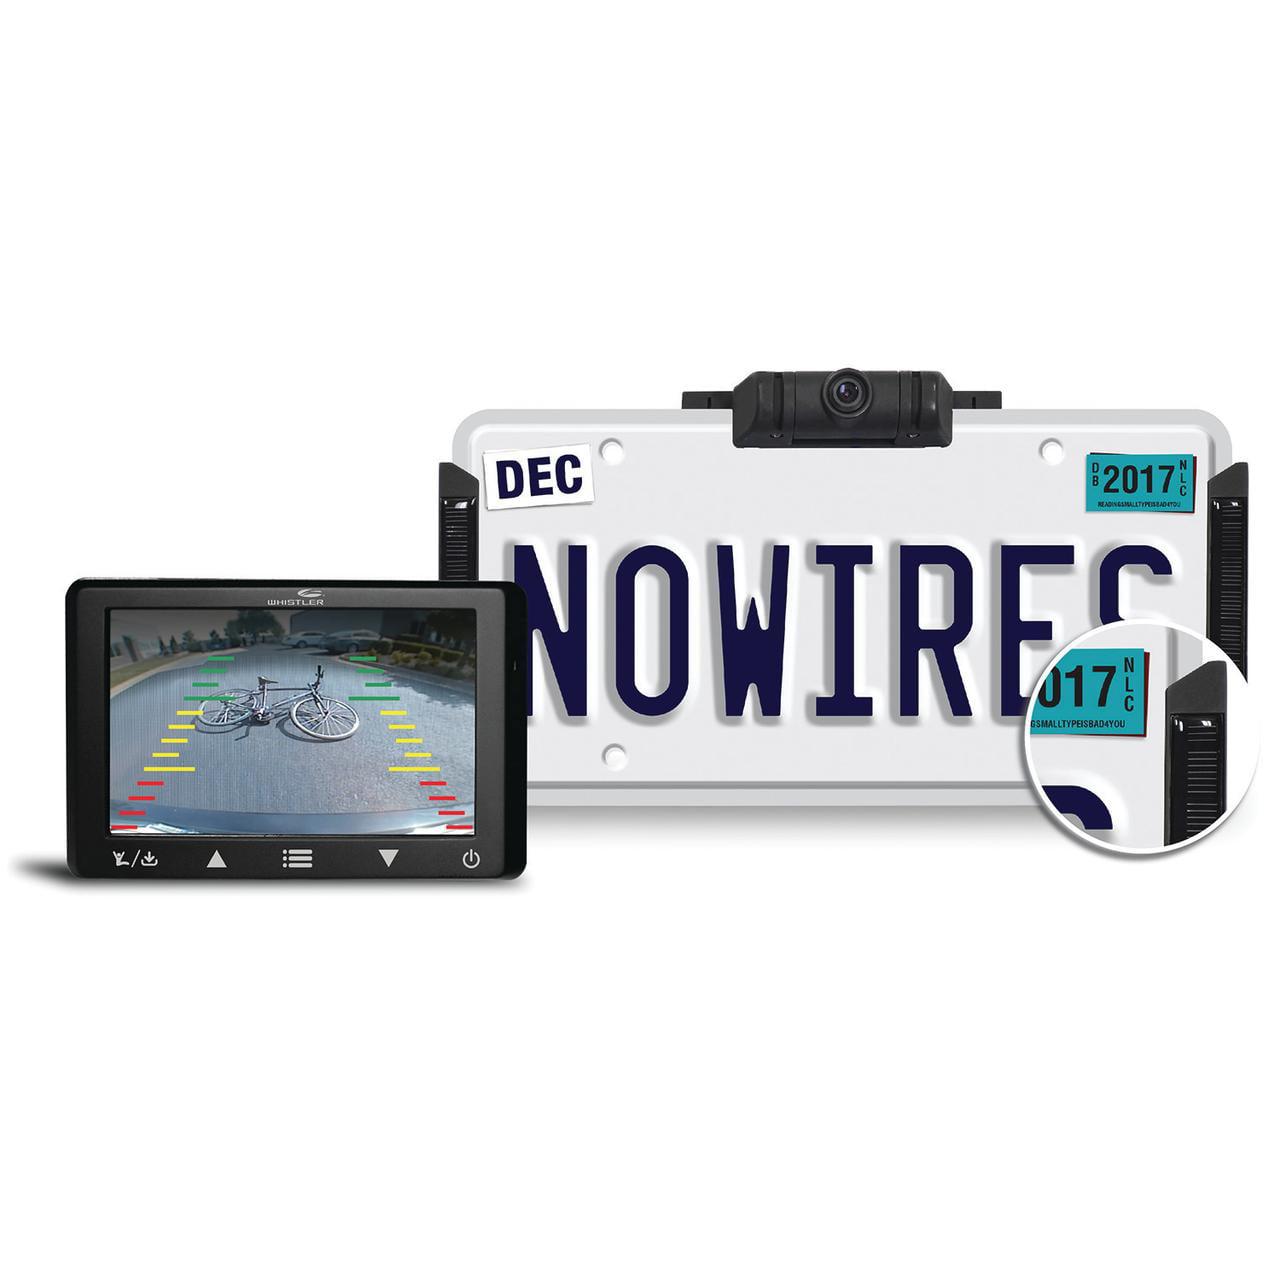 Whistler WBU-900 Digital Wireless Backup Camera by Whistler